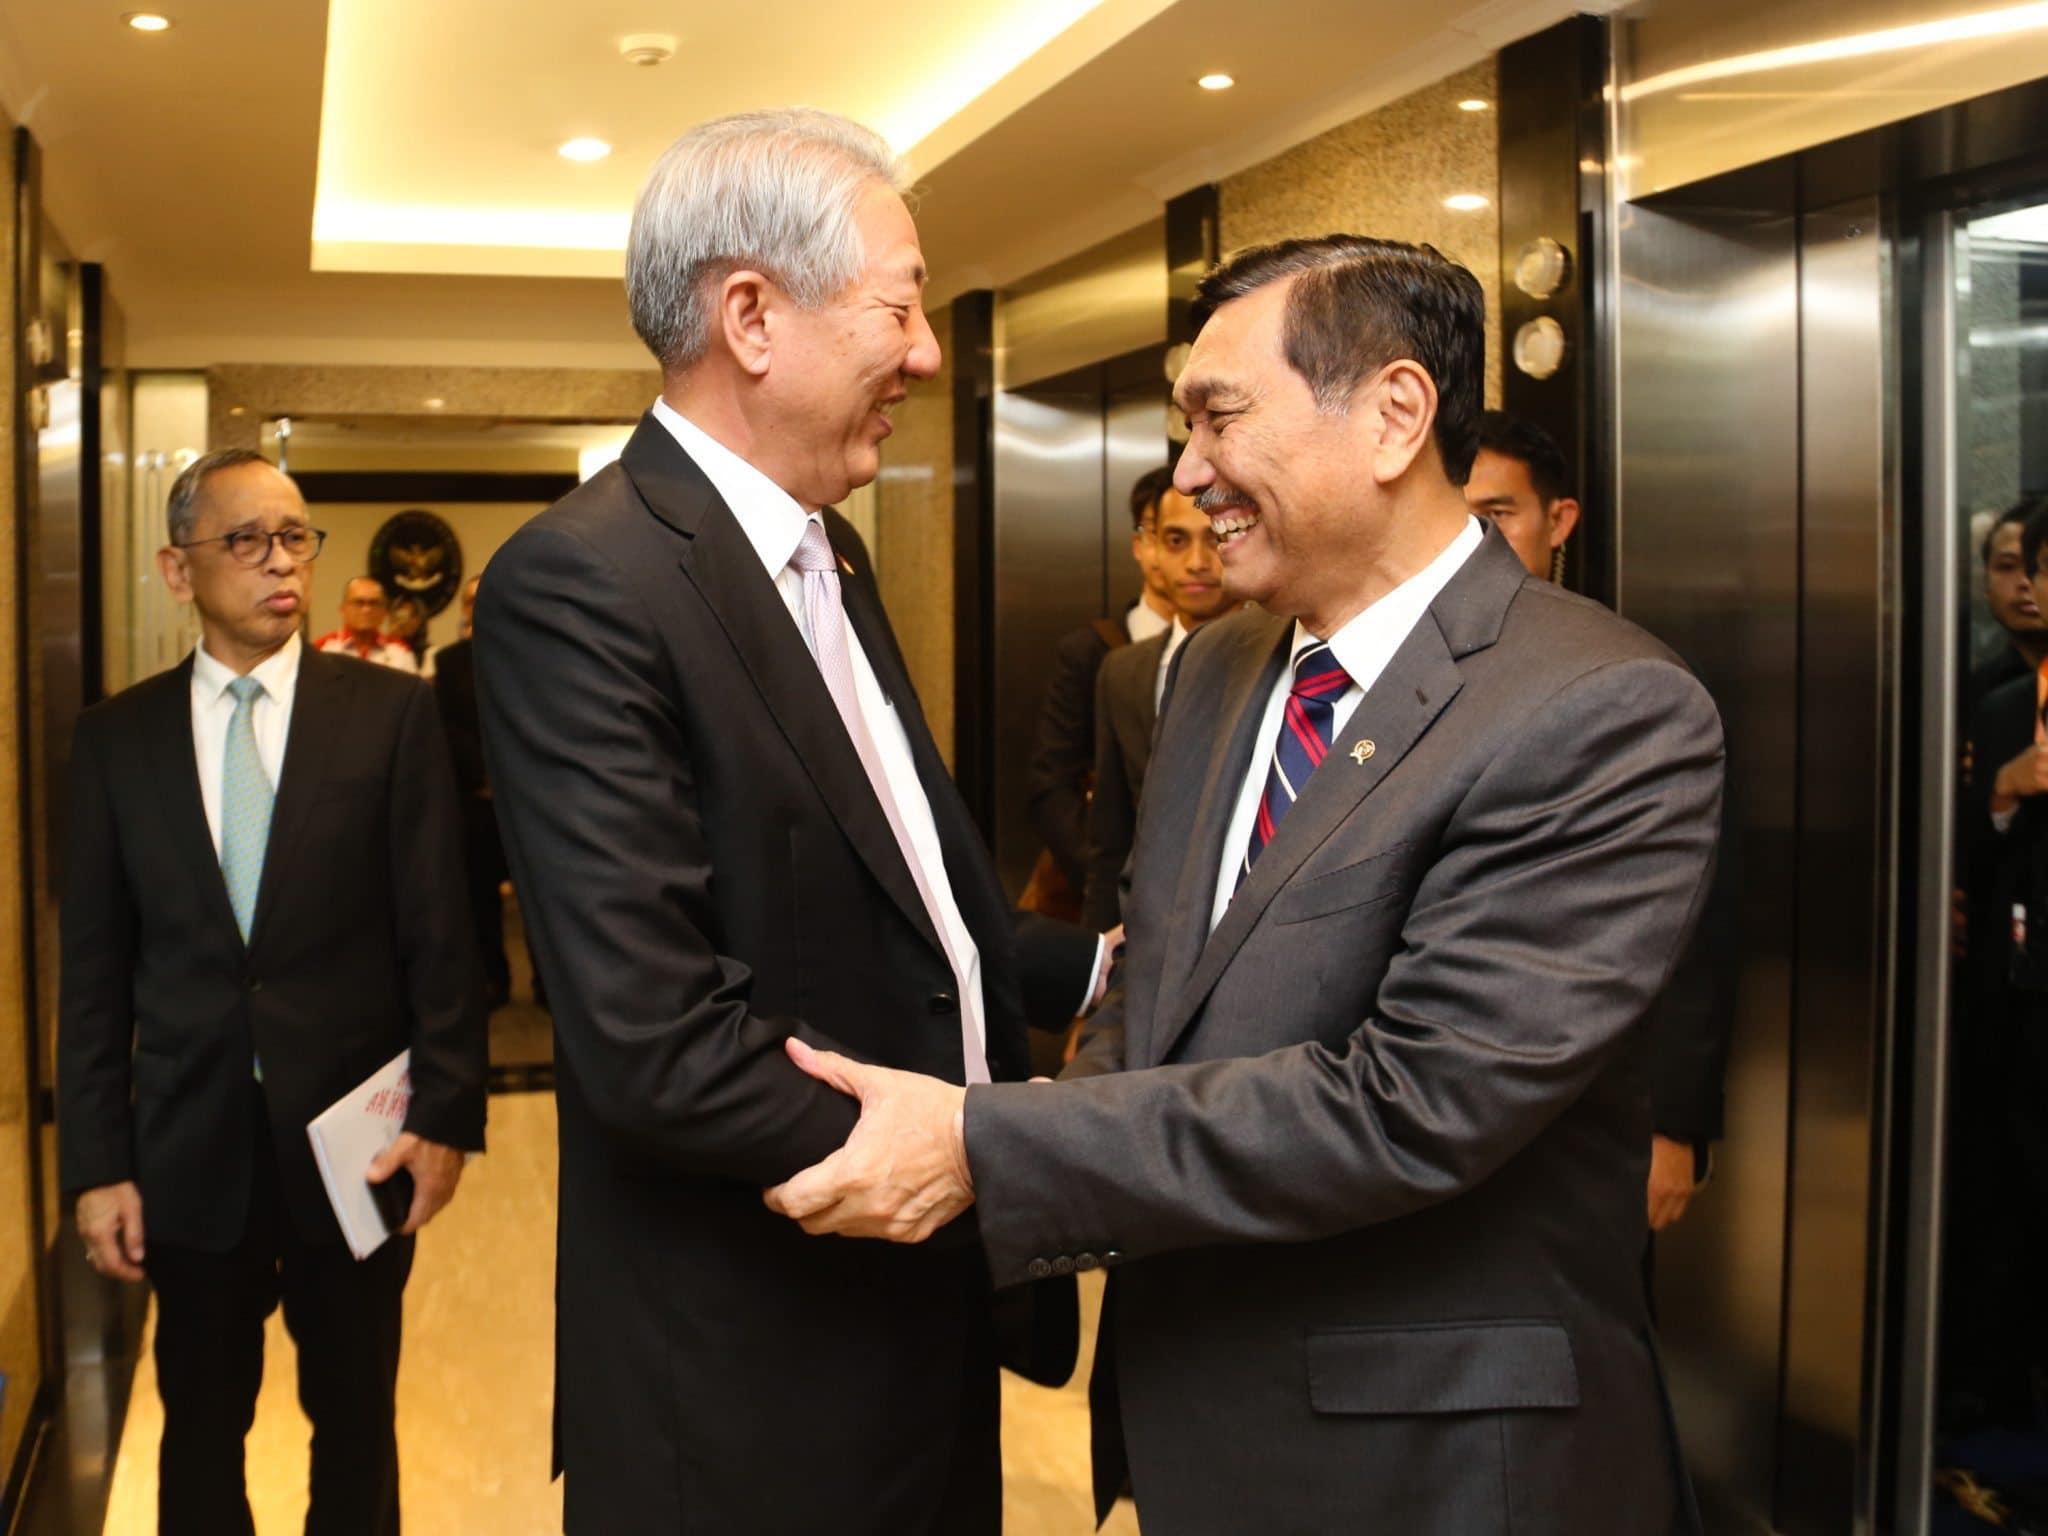 Menko Luhut Lunch Meeting bersama Mr. Teo Chee Hean (Deputi Perdana Menteri Singapura)